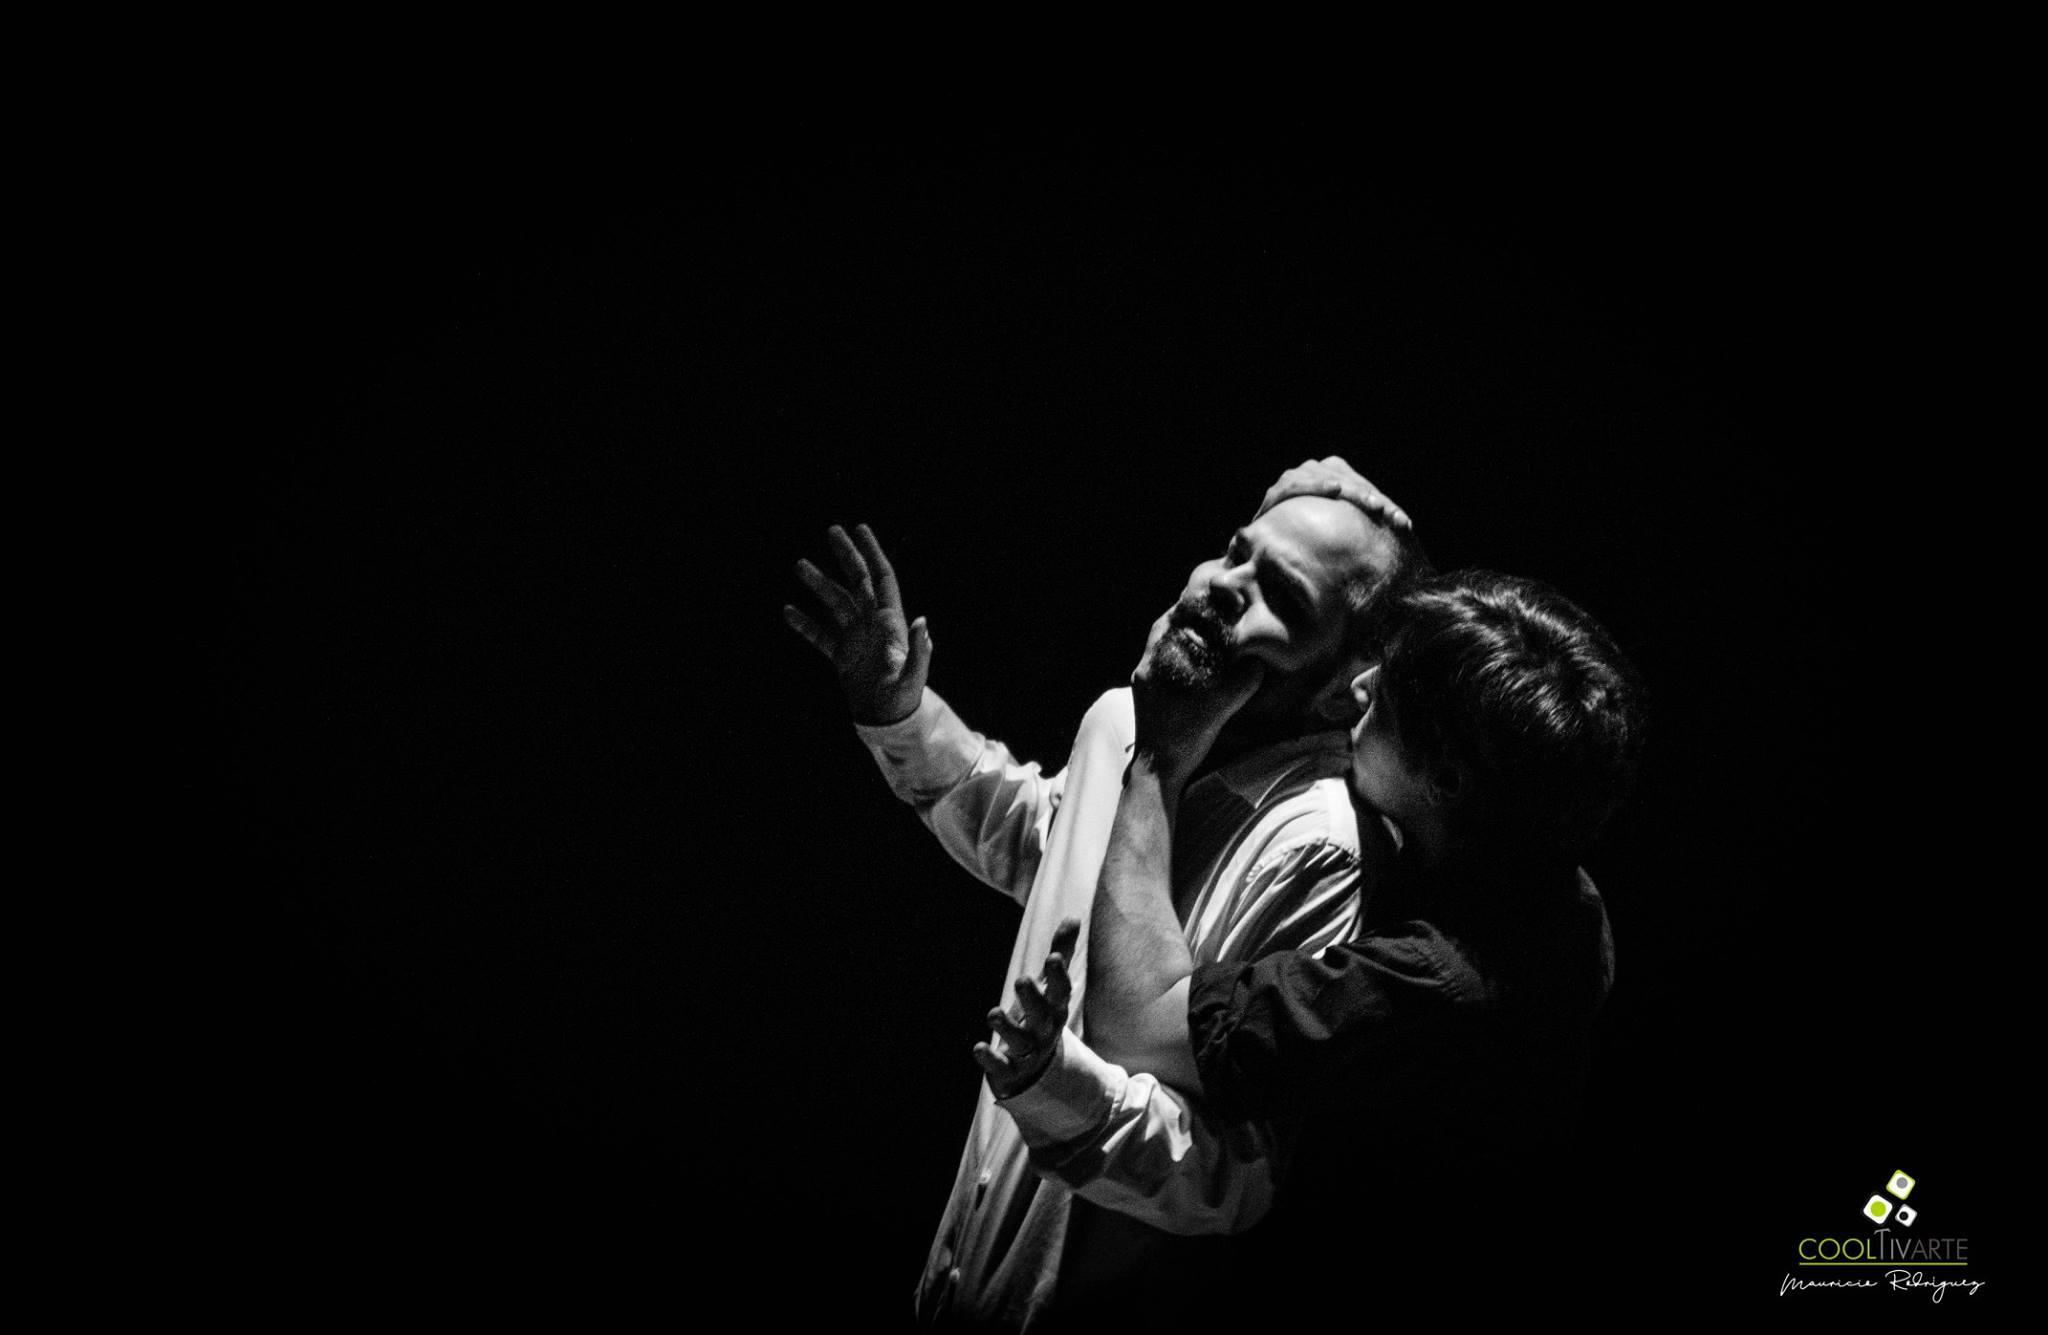 Ruido - Obra de Bruno Acevedo - Sala Zavala Muniz 26.06.18 - Con Julio Garay Pereyra Ximena Echevarria Germán Weinberg - Fotografía Mauricio Rodriguez - www.cooltivarte.com